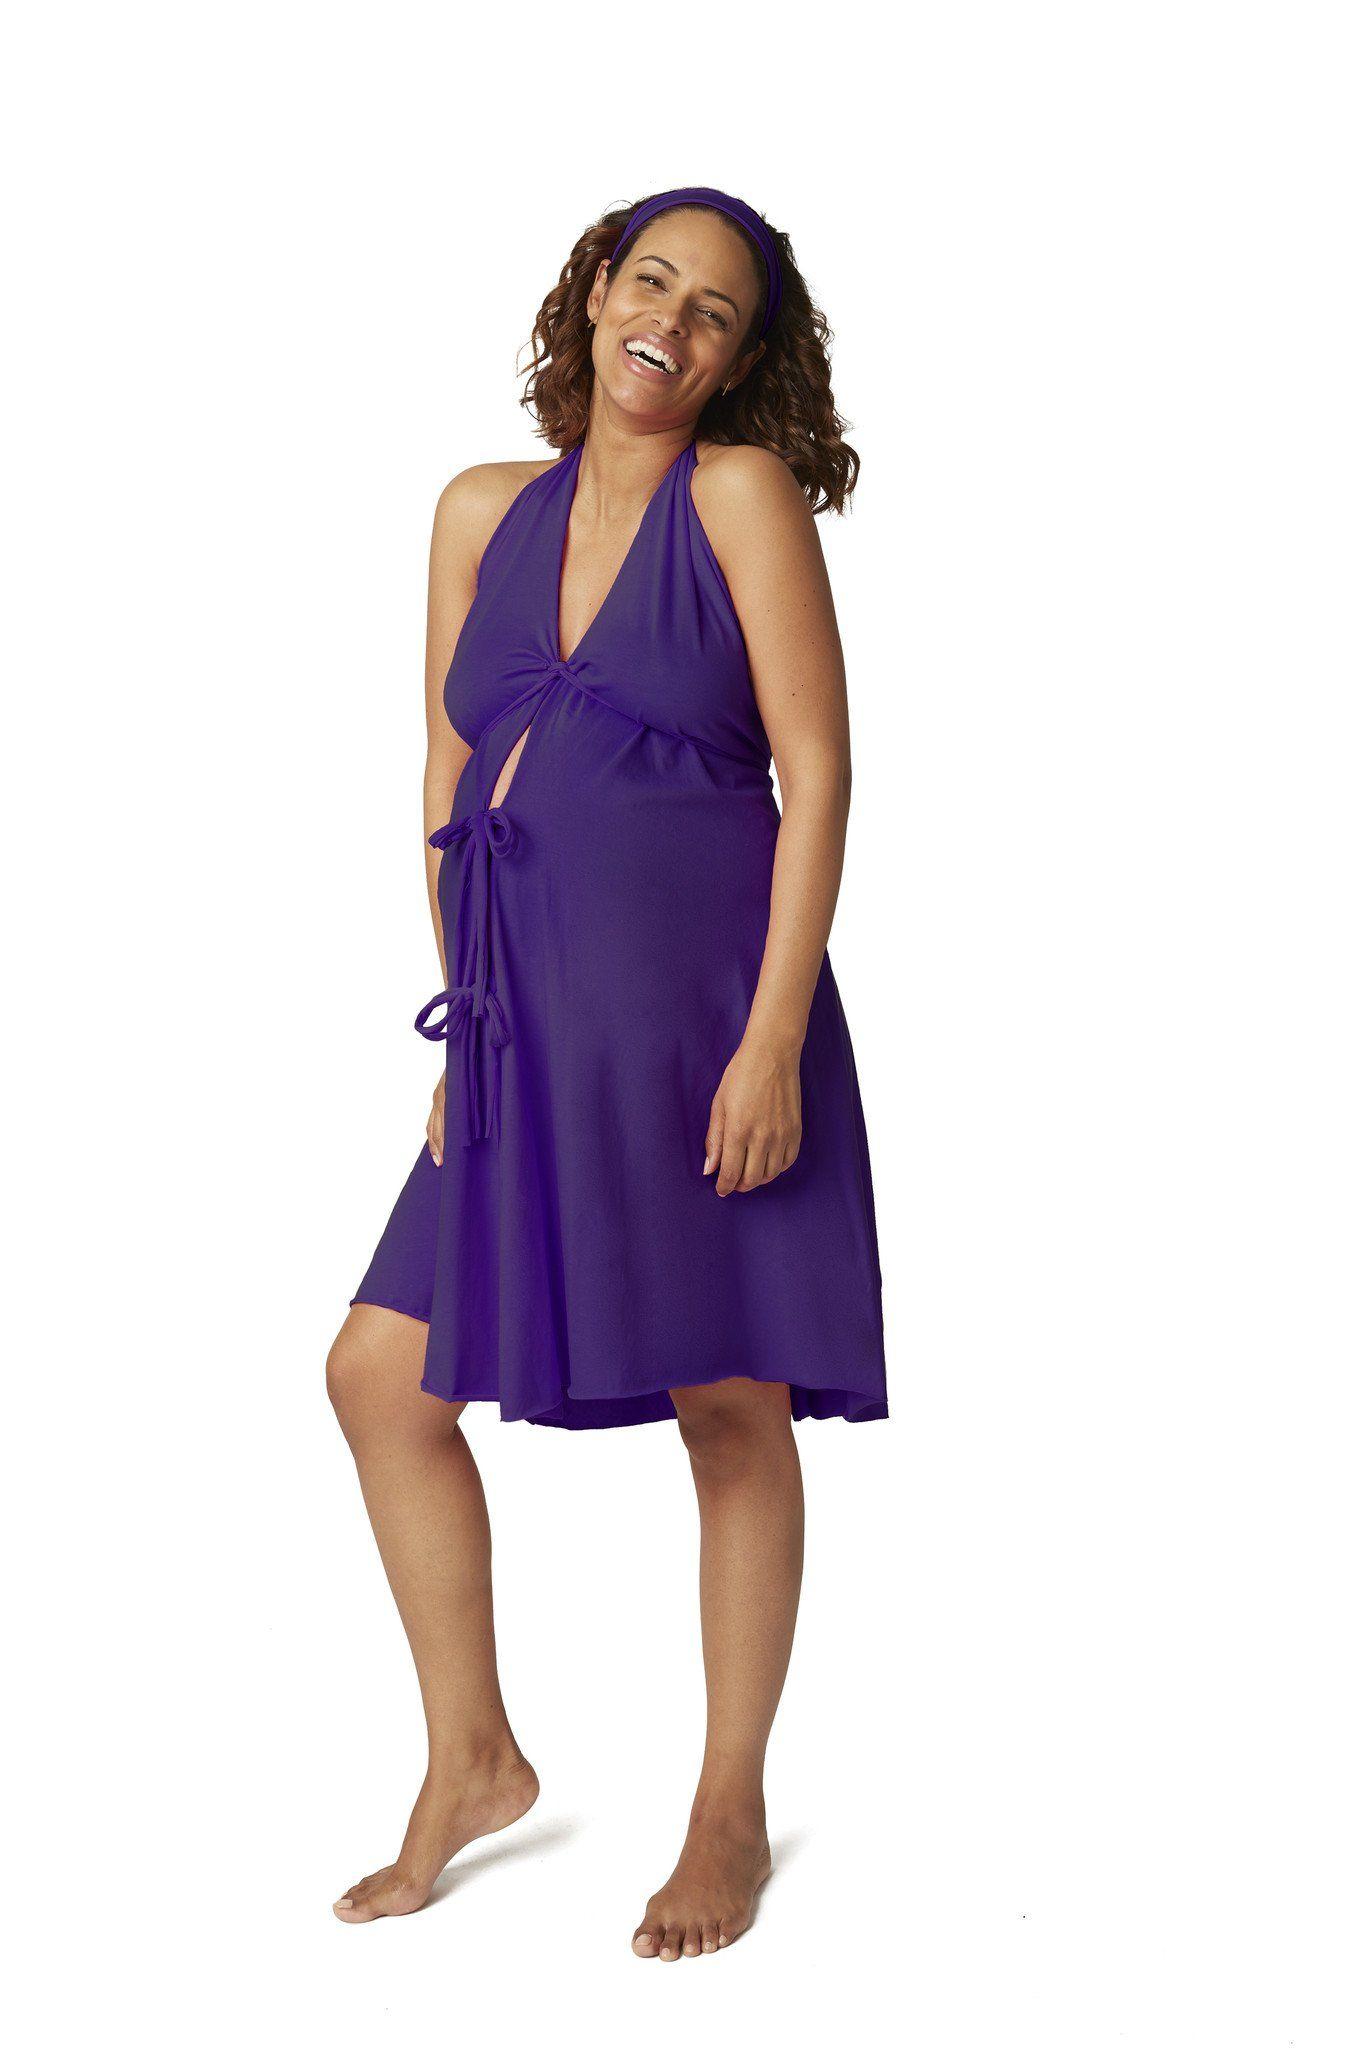 Original Labor & Delivery Gowns - Navy / Plus Size (18-26 pre ...